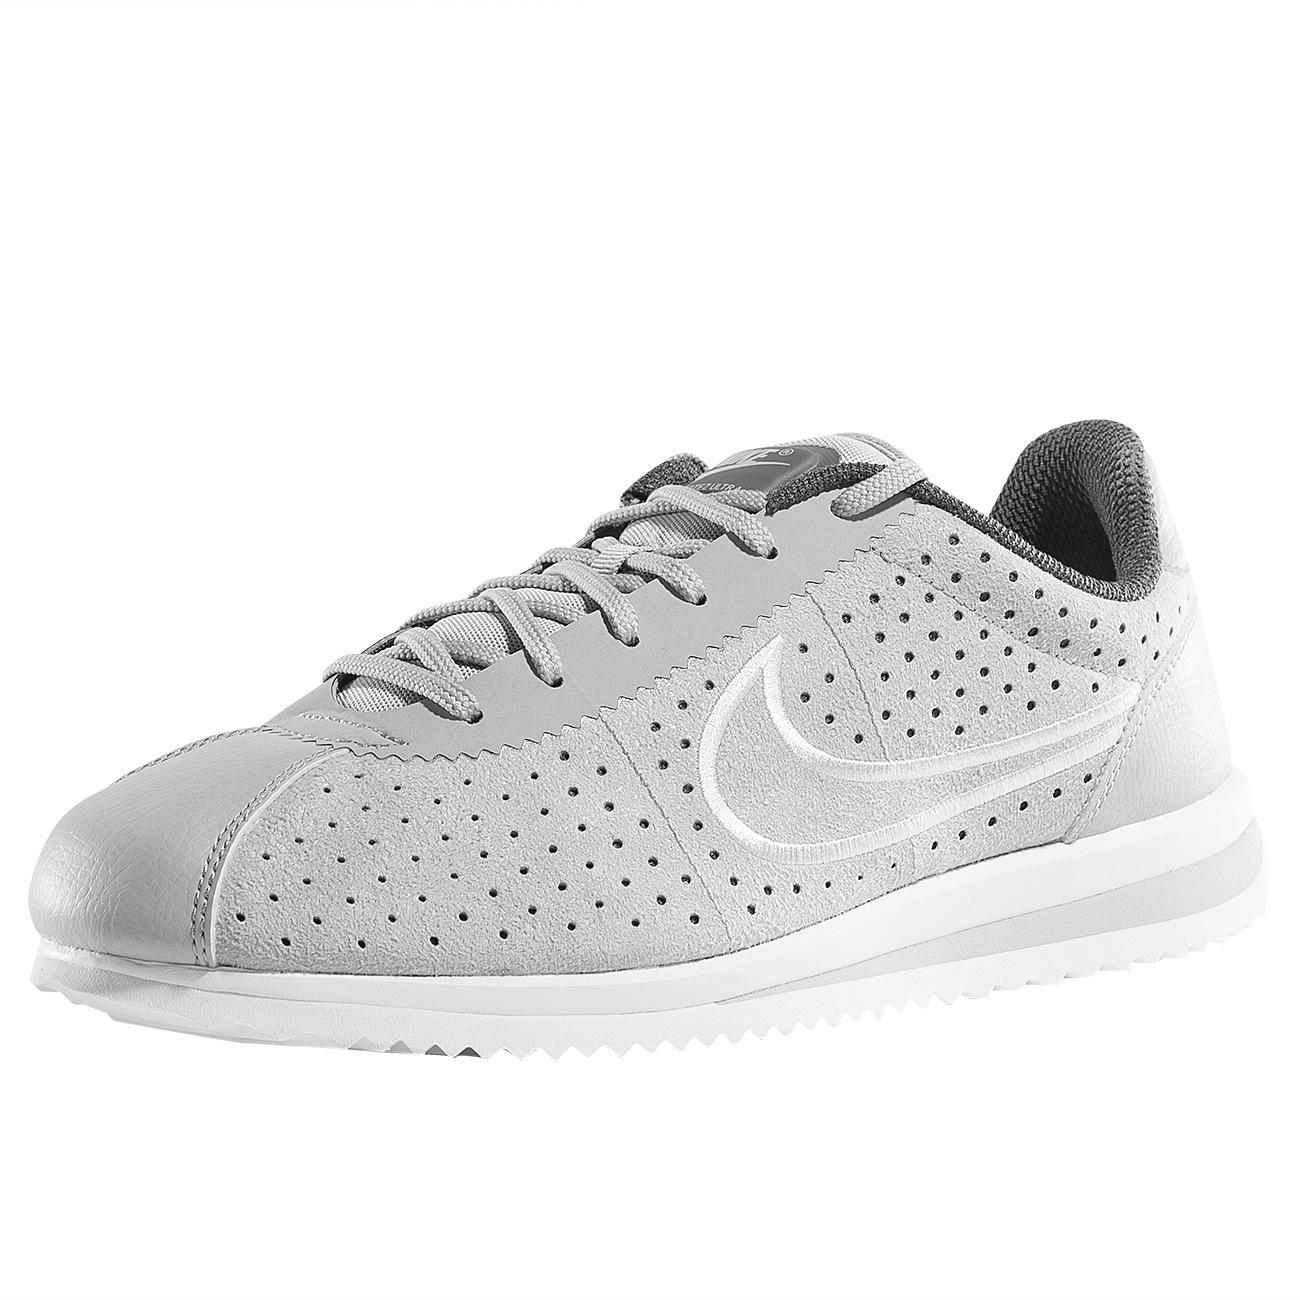 Nike Unisex Erwachsene Zapatillas Cortez Ultra Moire Fitnessschuhe  Marineblau Mehrfarbig Multicolor 918207 002